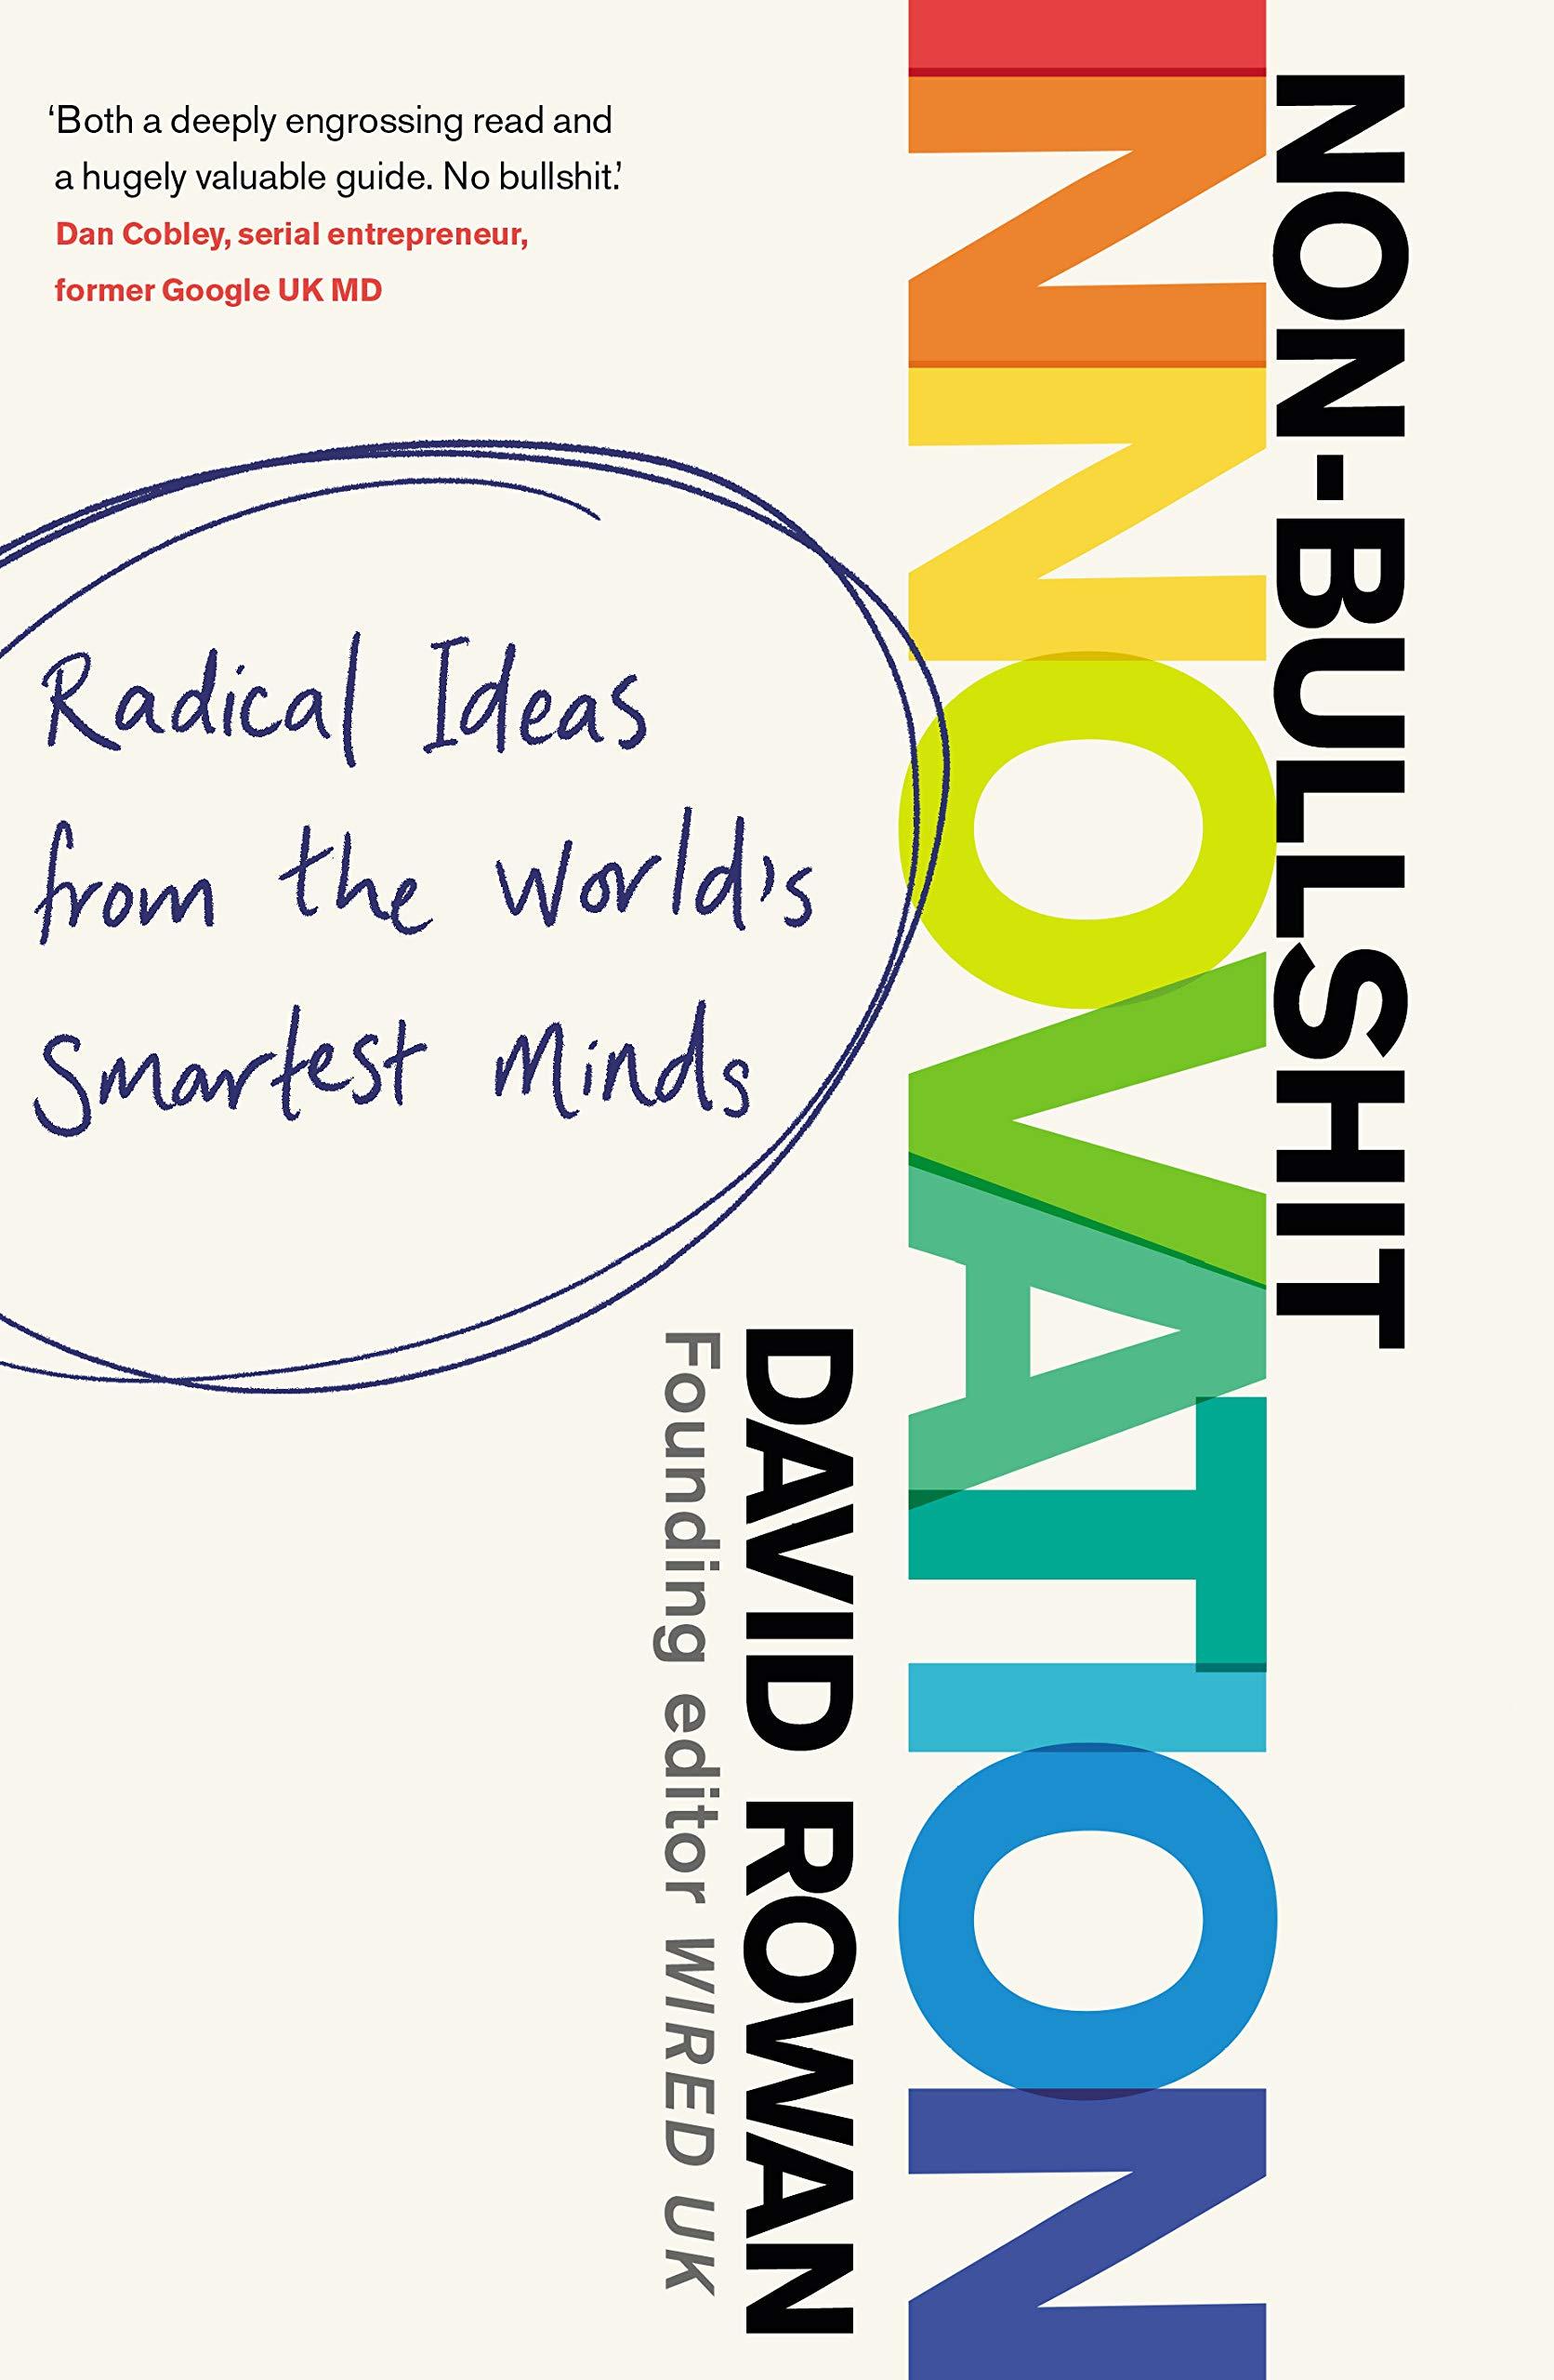 Non-Bullshit Innovation: Radical Ideas from the World's Smartest Minds.